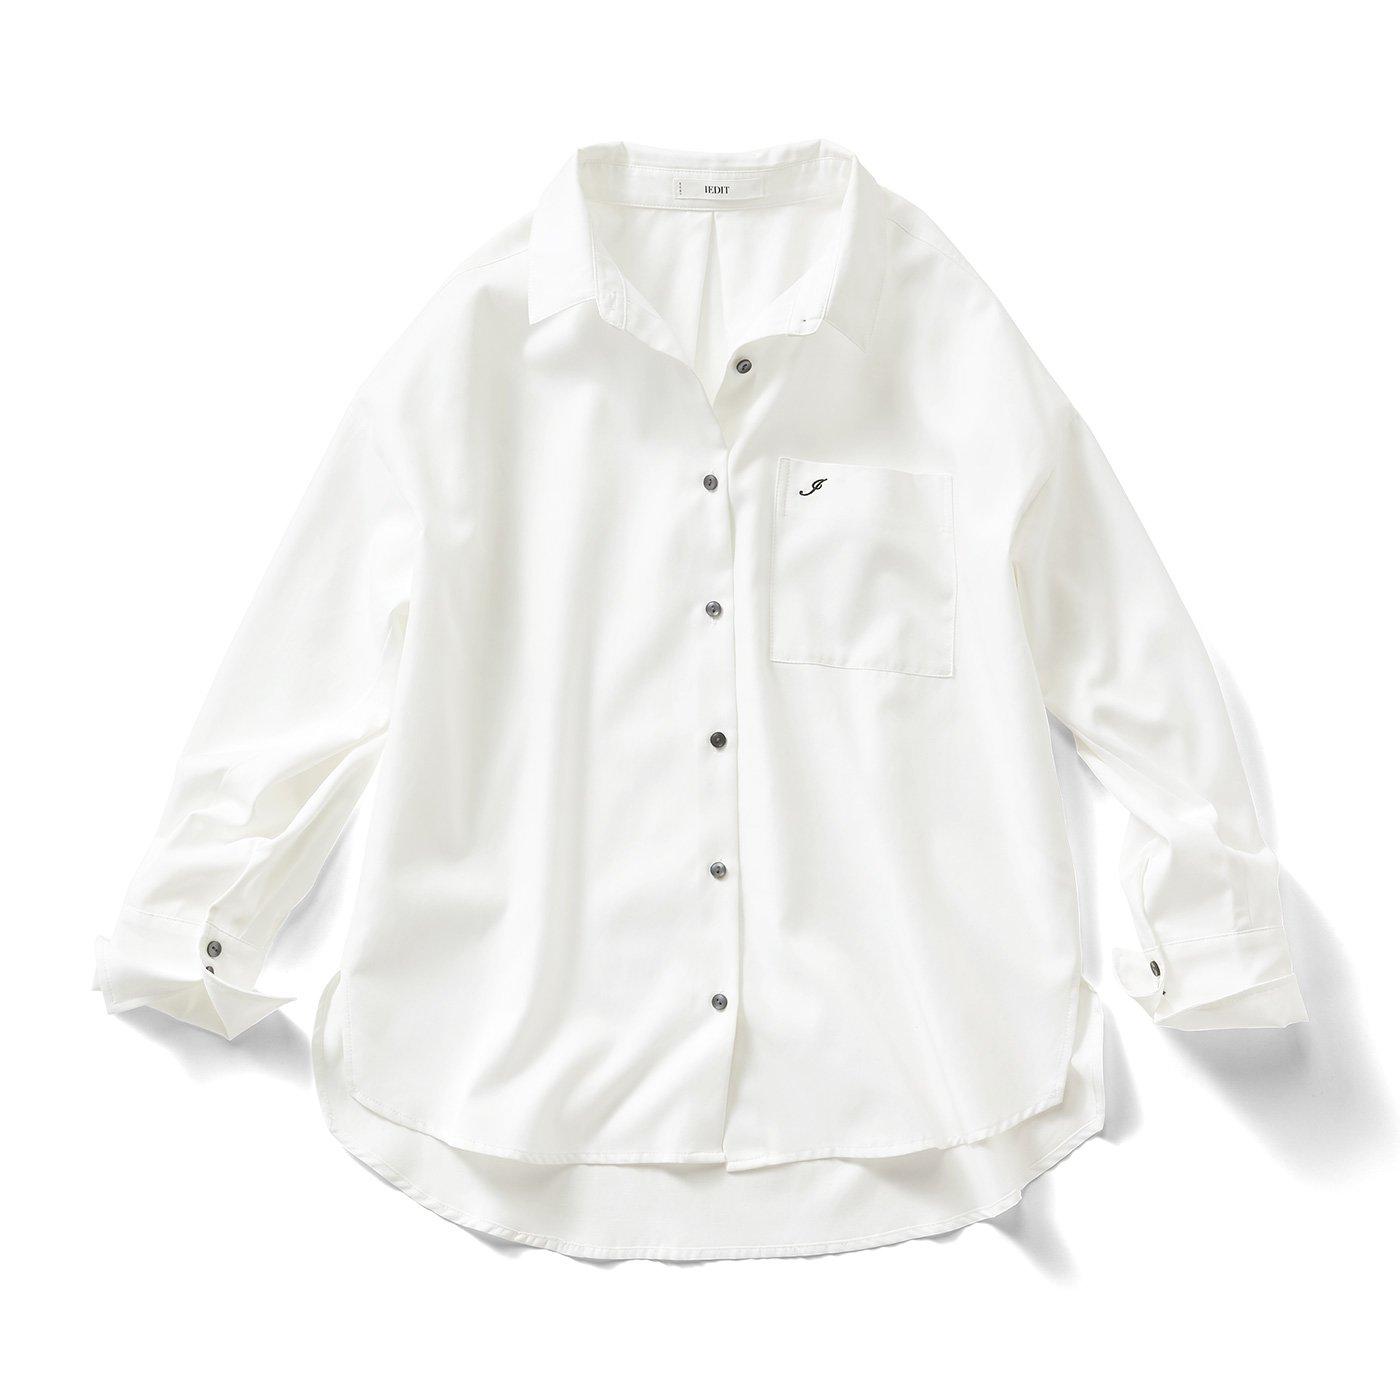 IEDIT[イディット] クレバー素材のしなやかこだわりシャツ〈オフホワイト〉